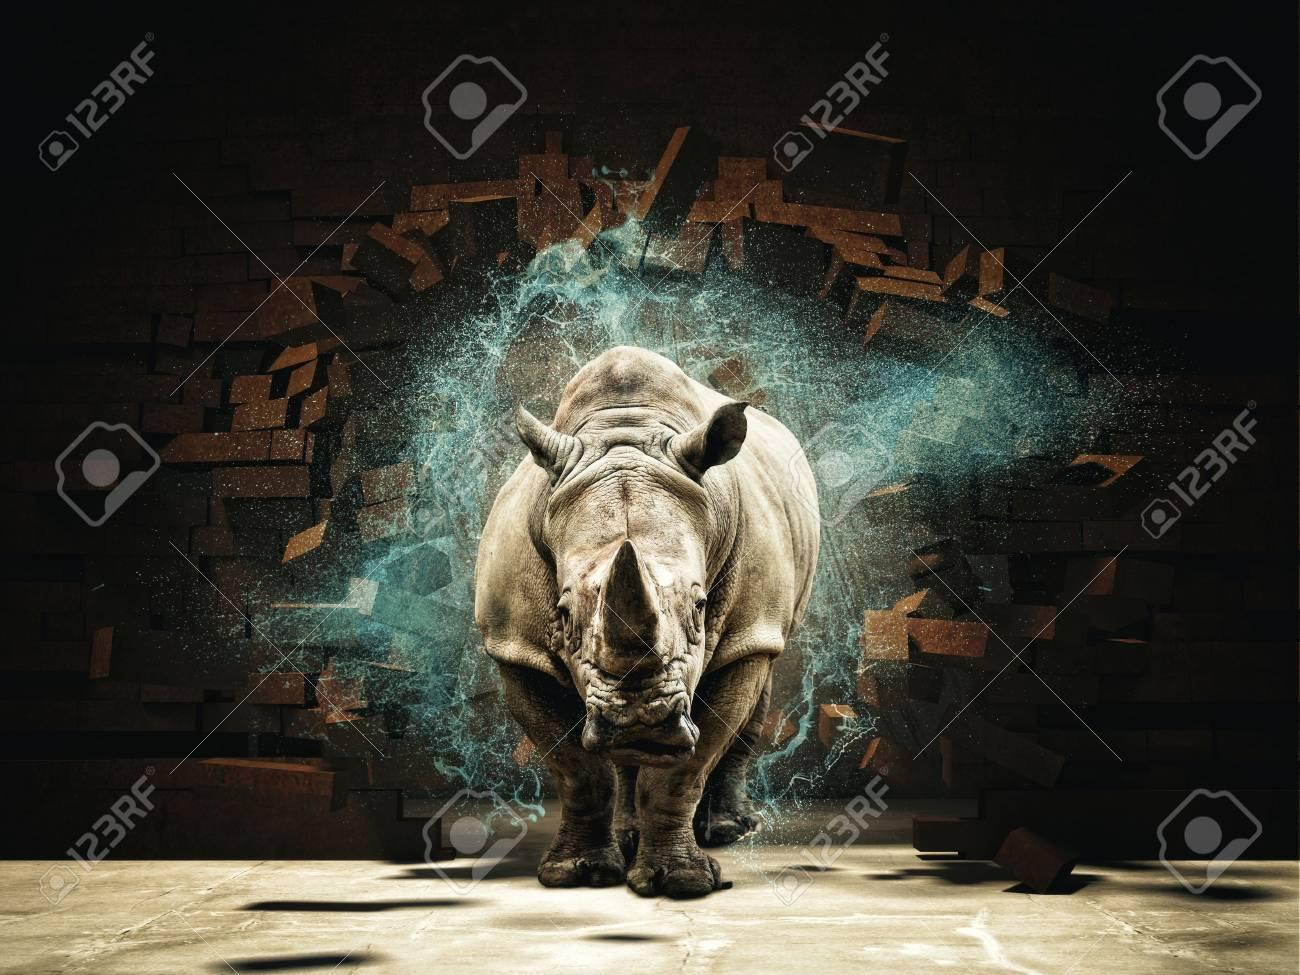 rhino destroy brick wall 3d rendering image - 73014030